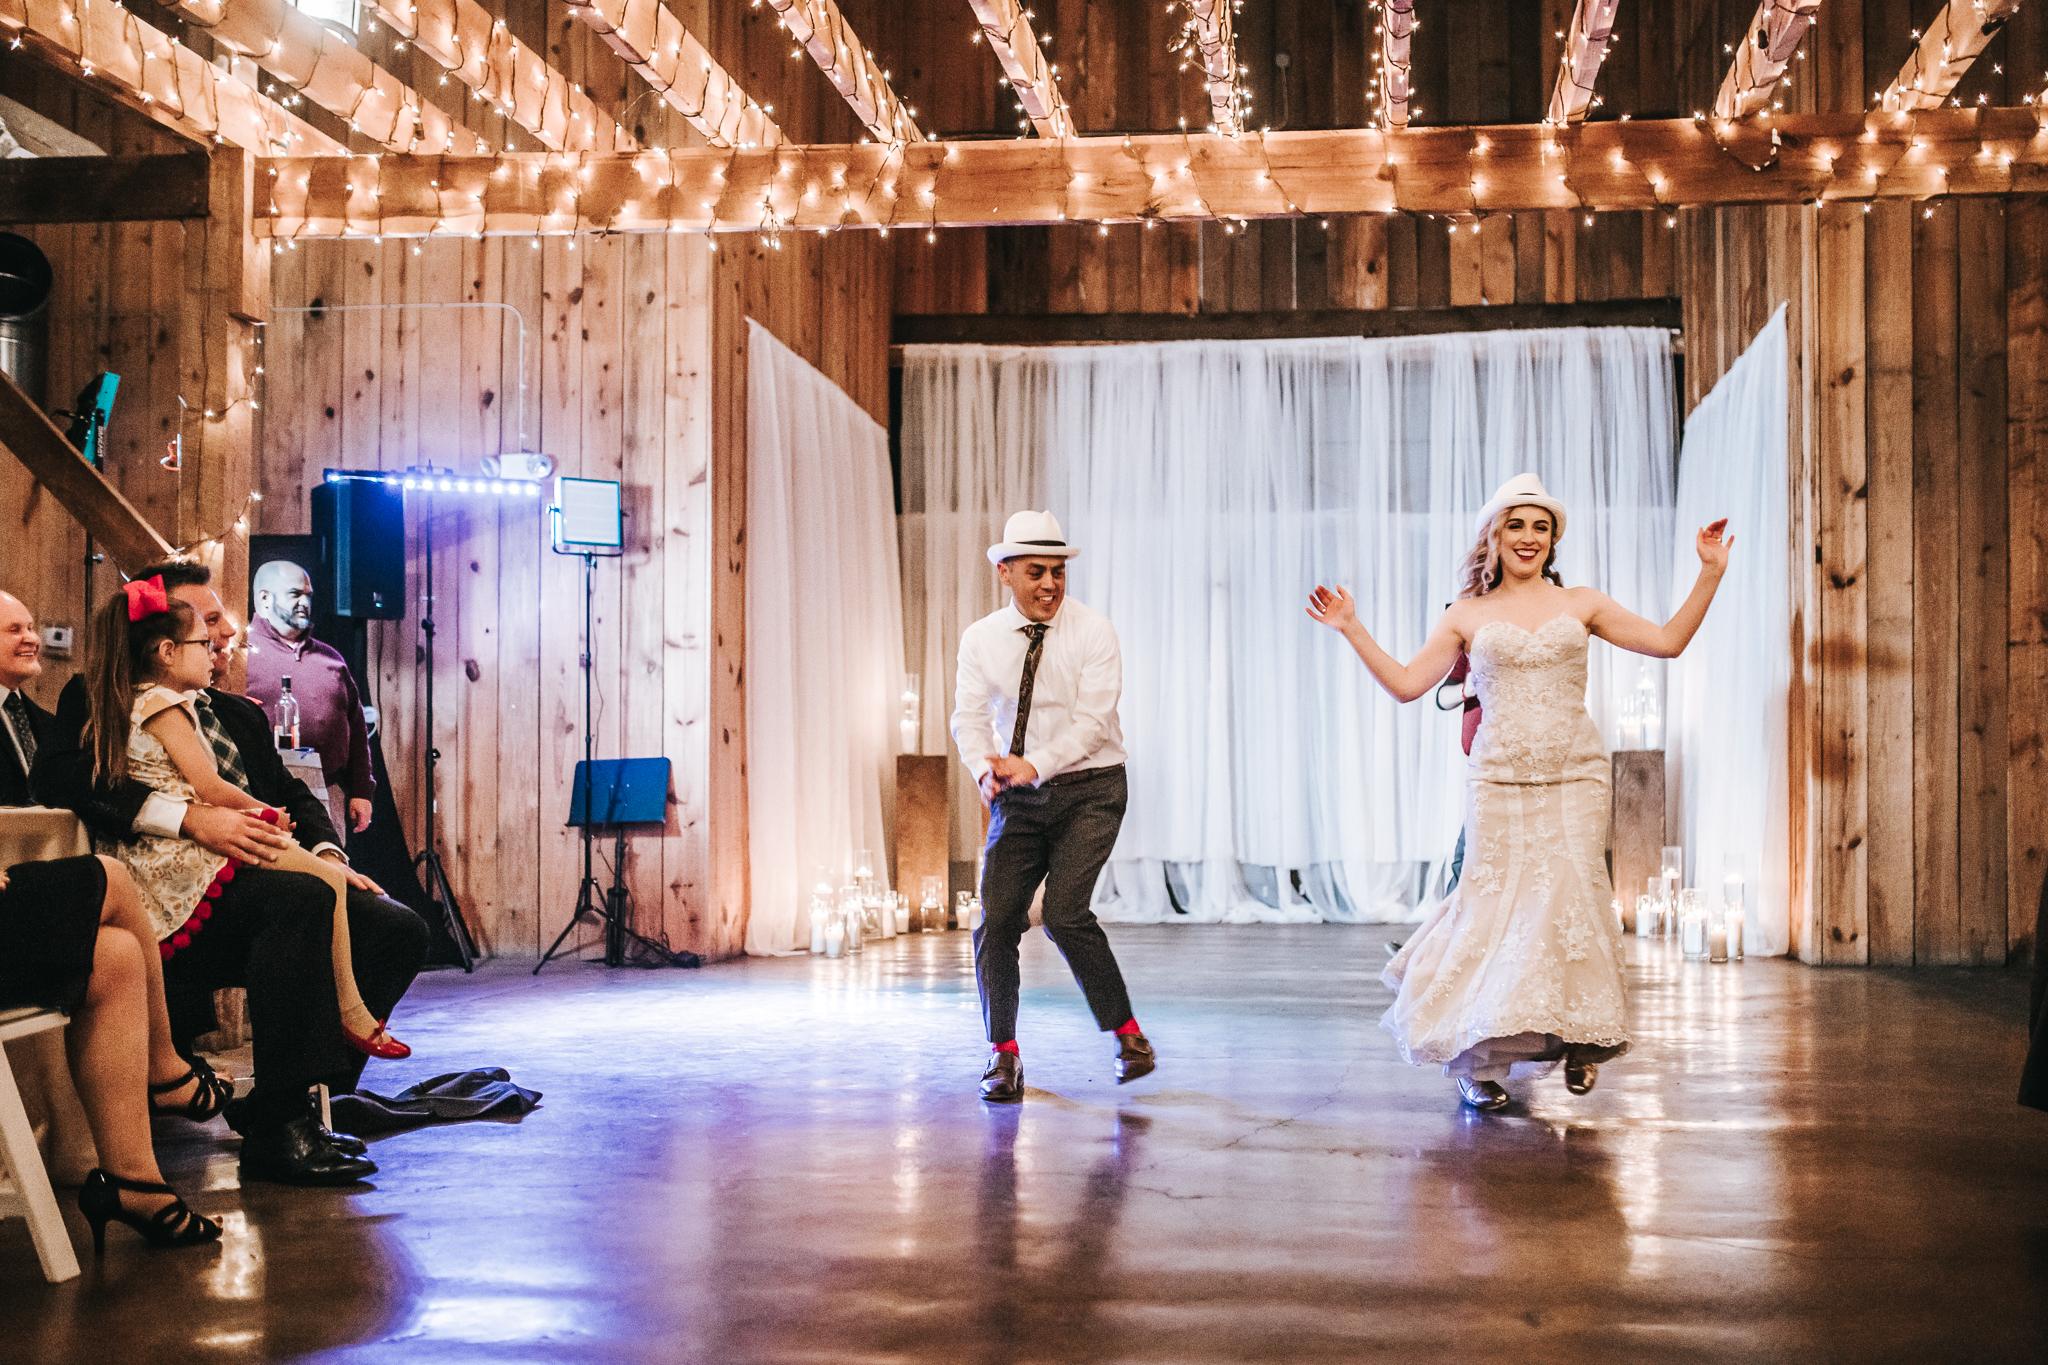 0171 Ariana Jordan Photo - Cameron & Lauren's Wedding at Talon Winery  7735.jpg